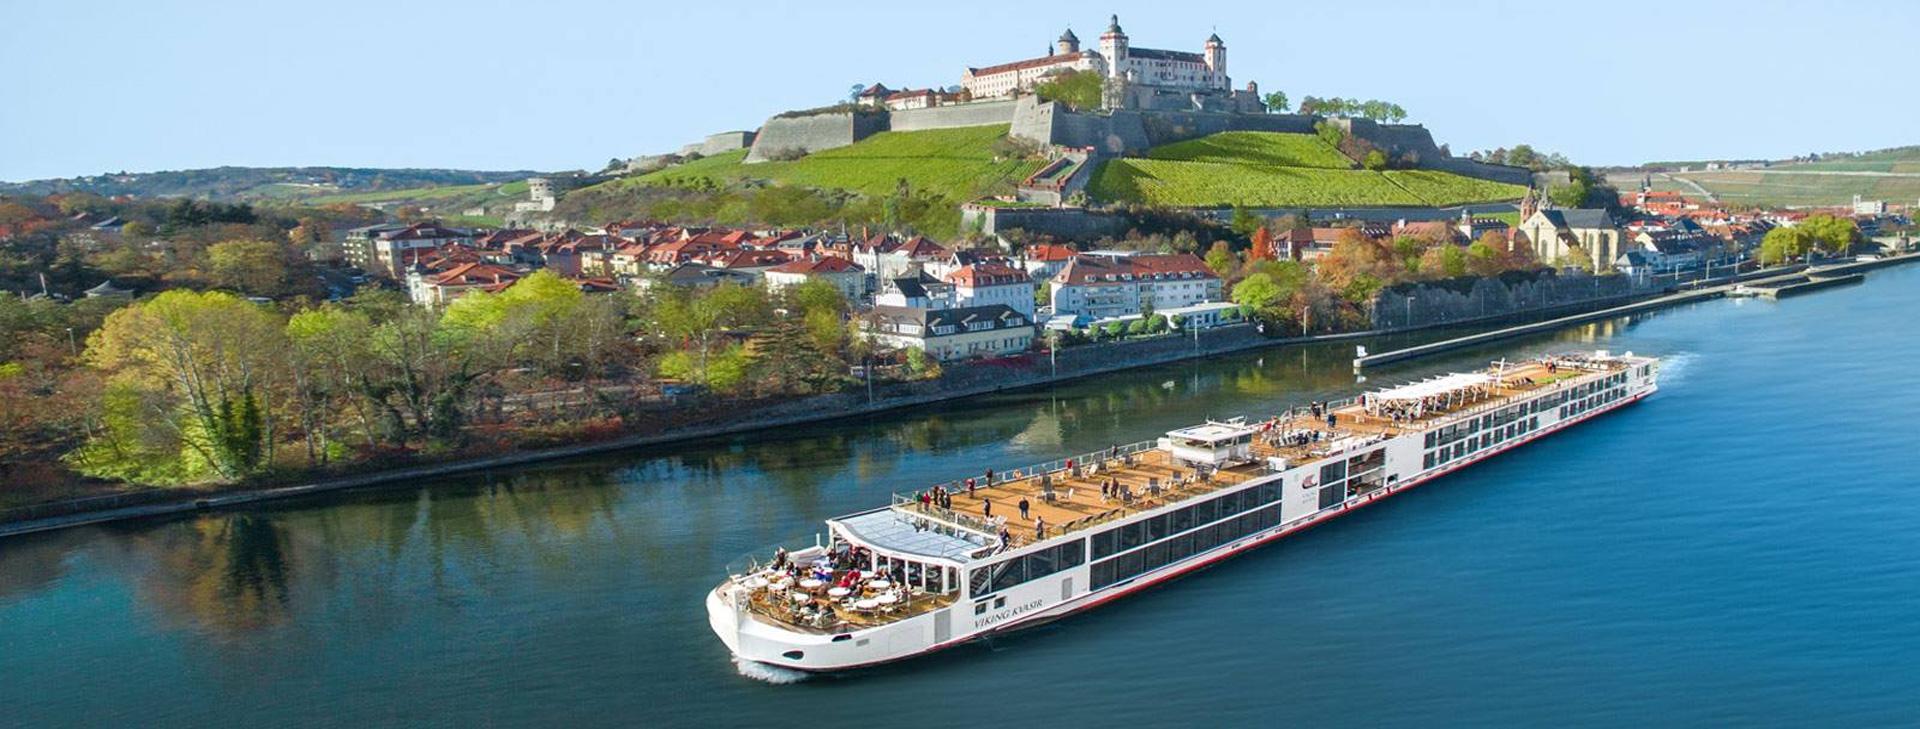 Vip Travel 1 Usa Tour Operator Travel Eastern Europe Professional Vip Alpine Tours